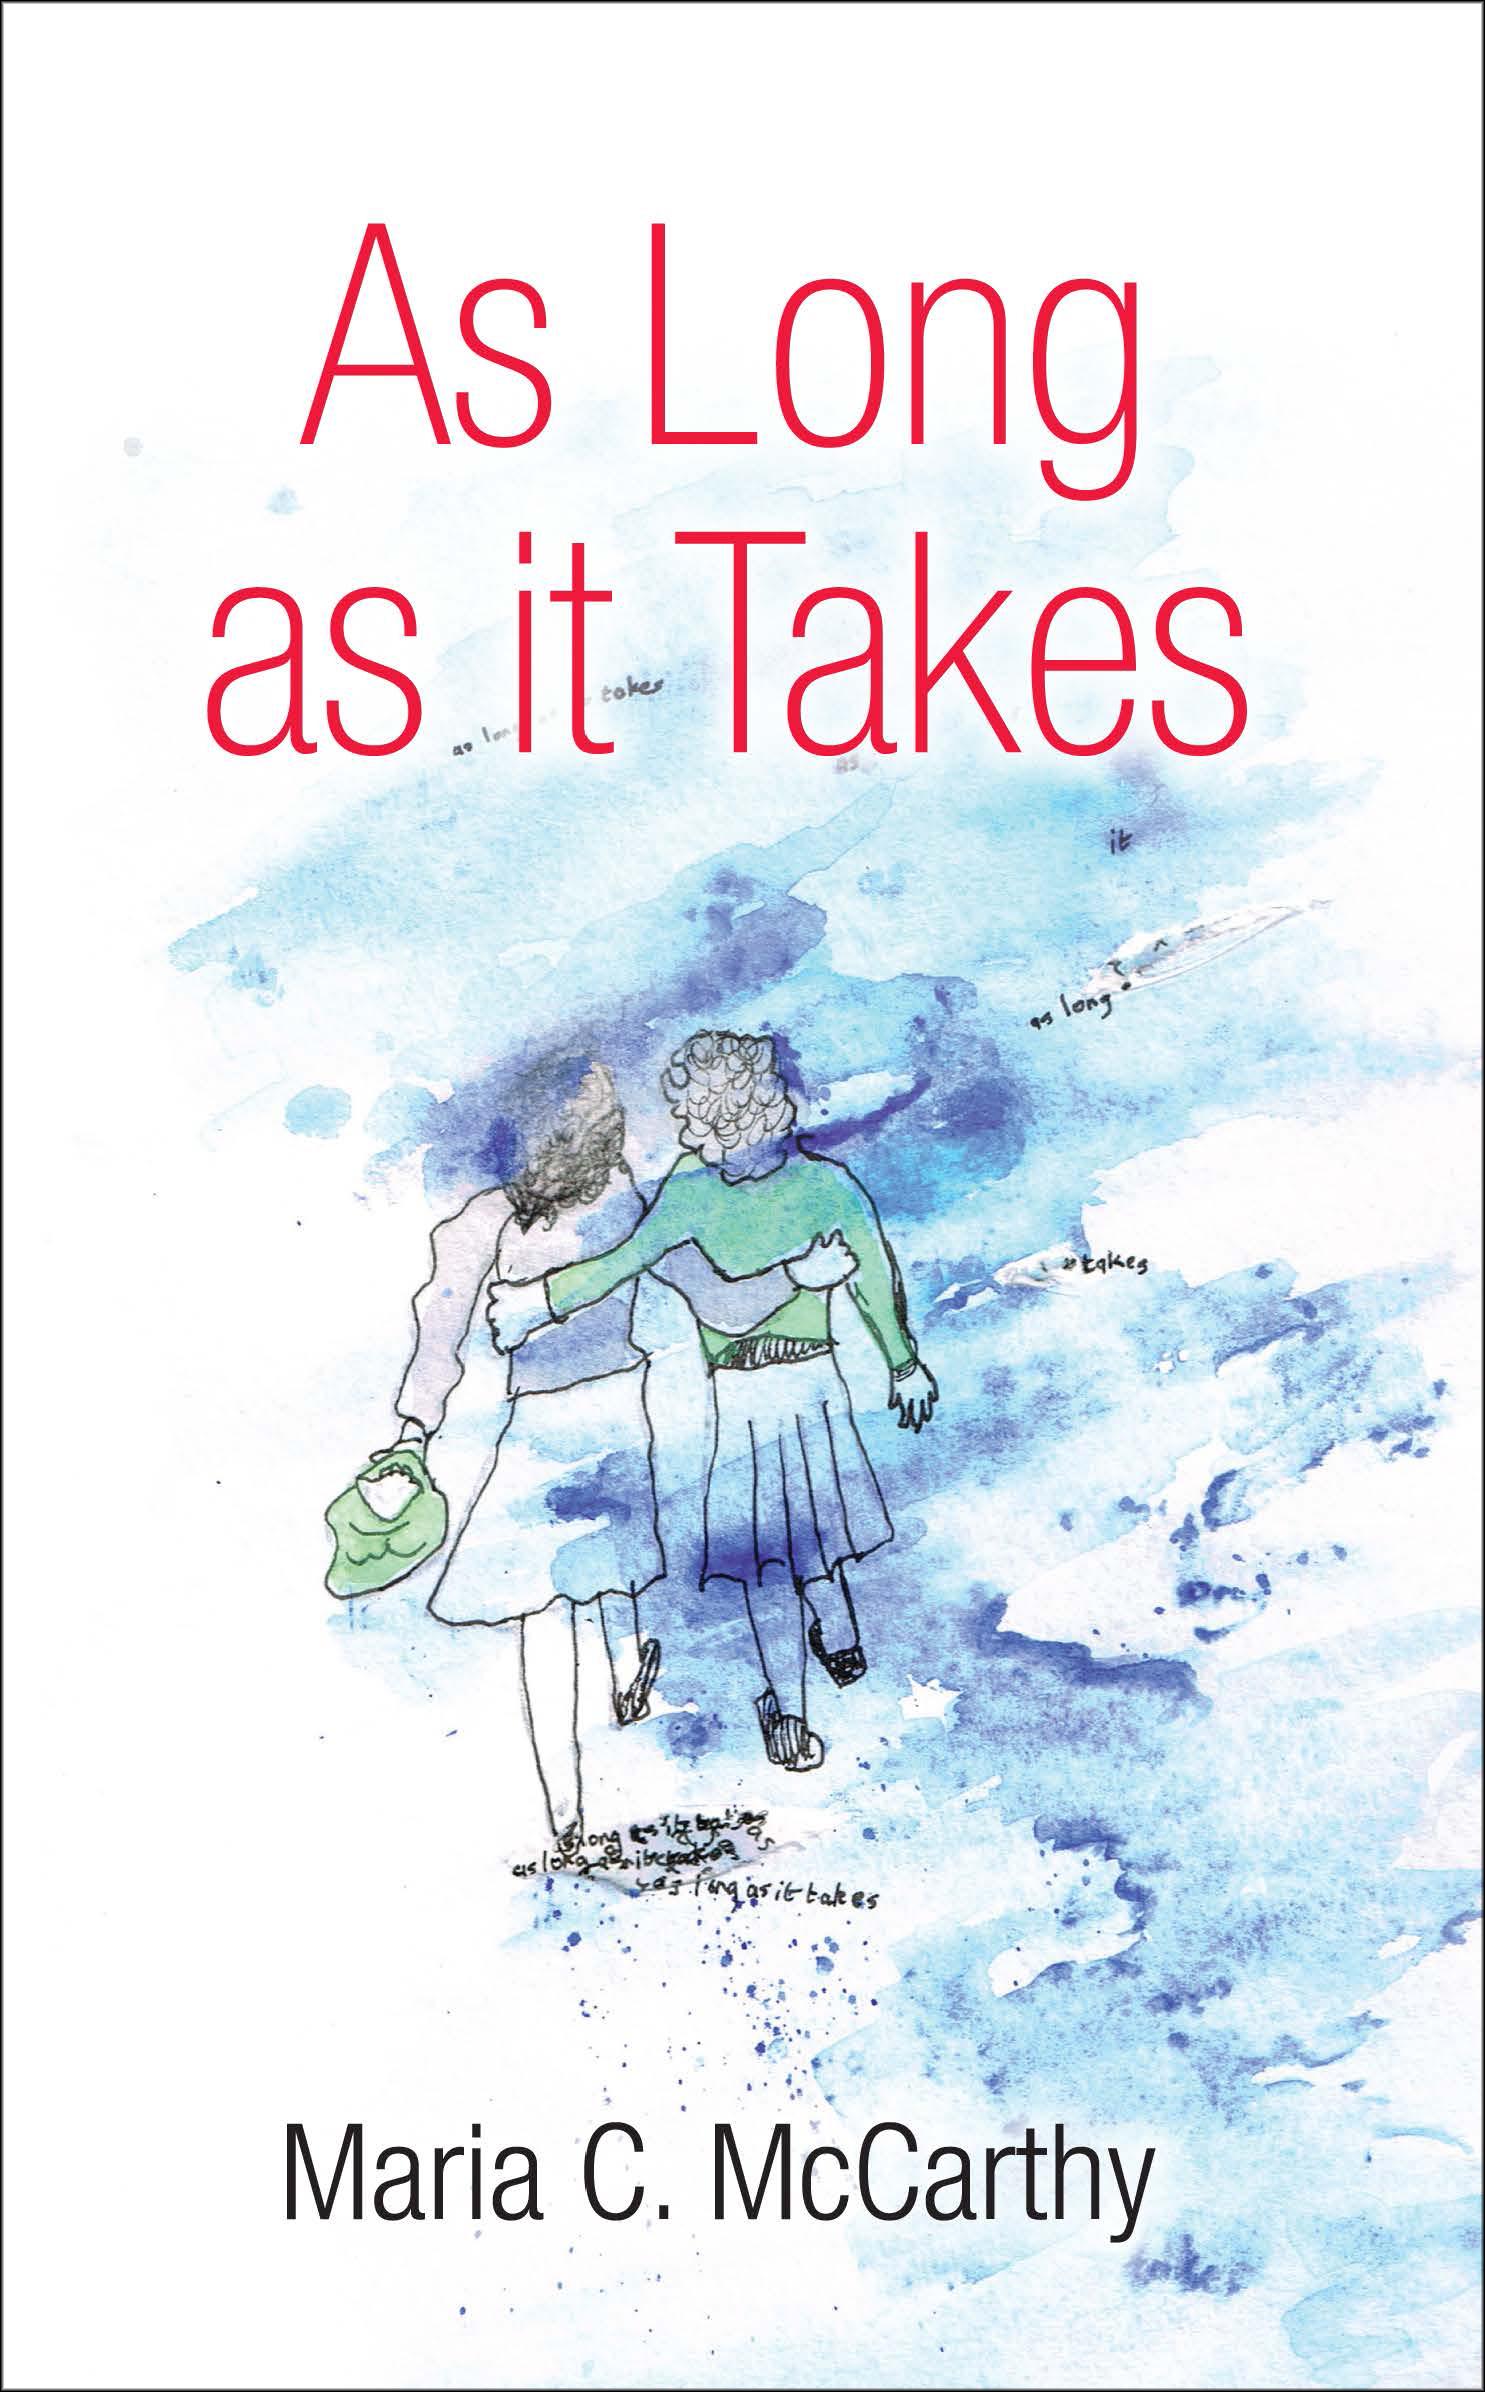 As Long As it Takes by Maria C. McCarthy